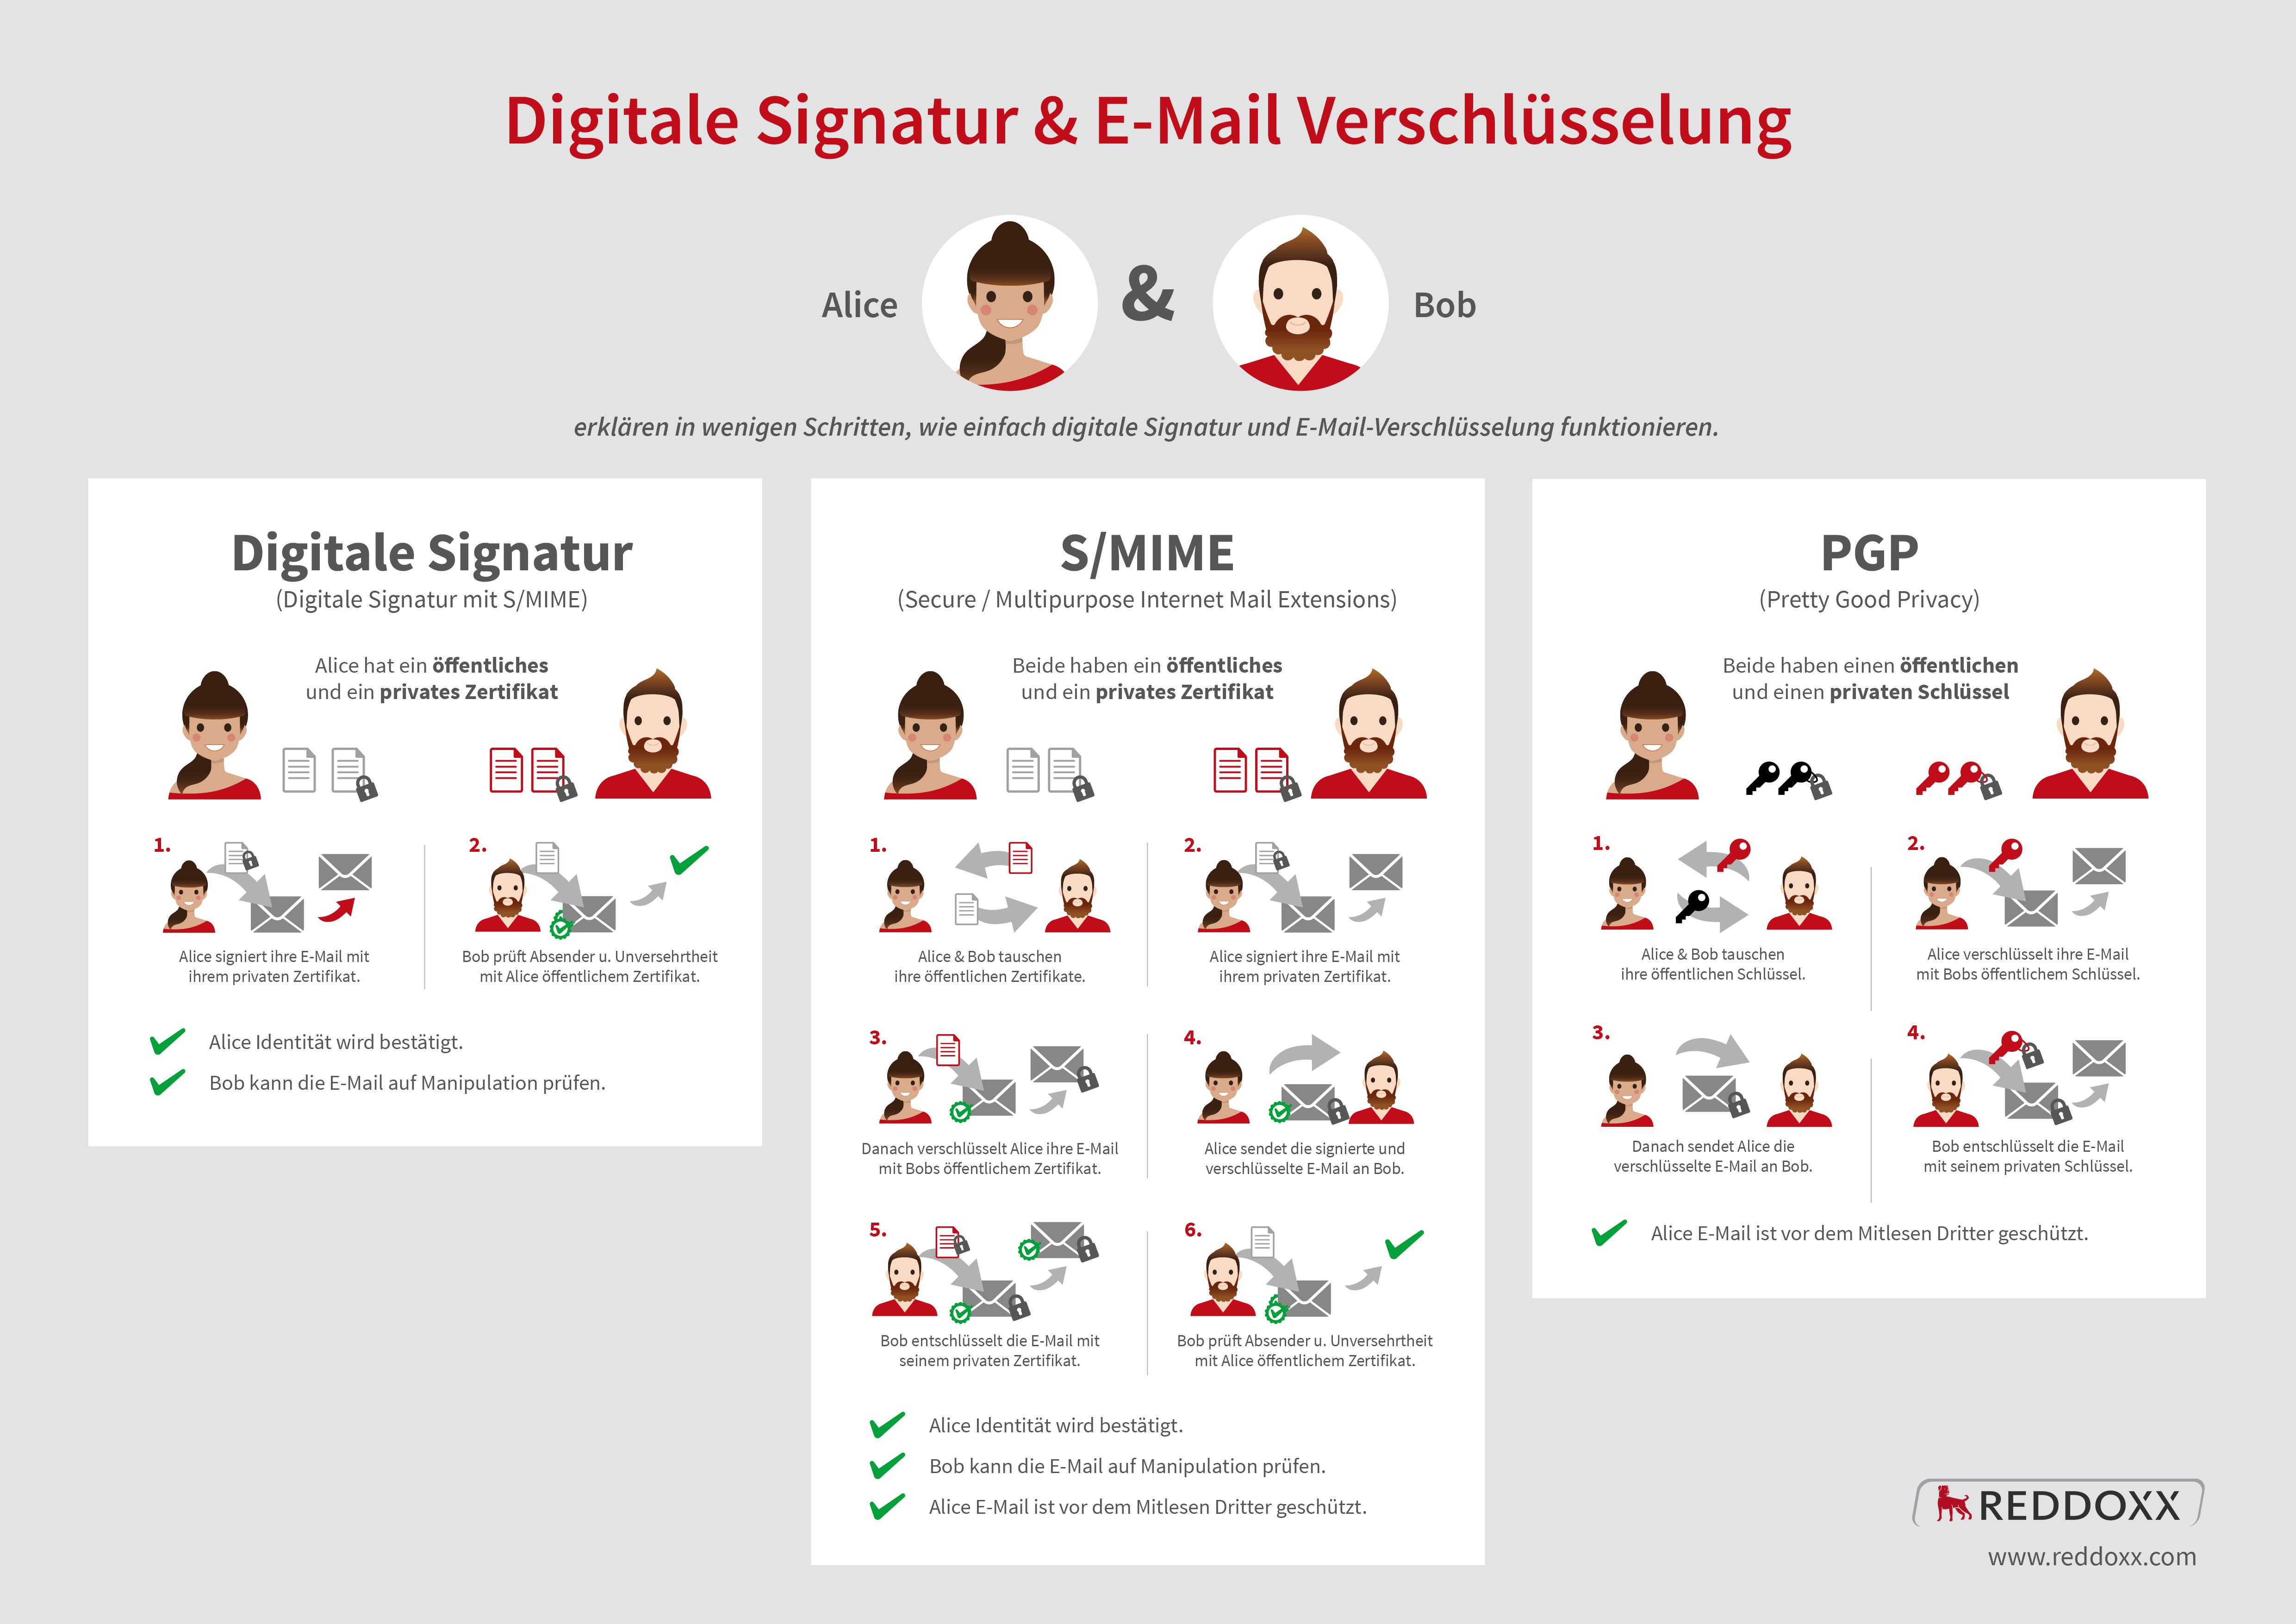 Infografik E-Mailverschlüsselung - Infografik digitale Signatur - S/MIME - PGP